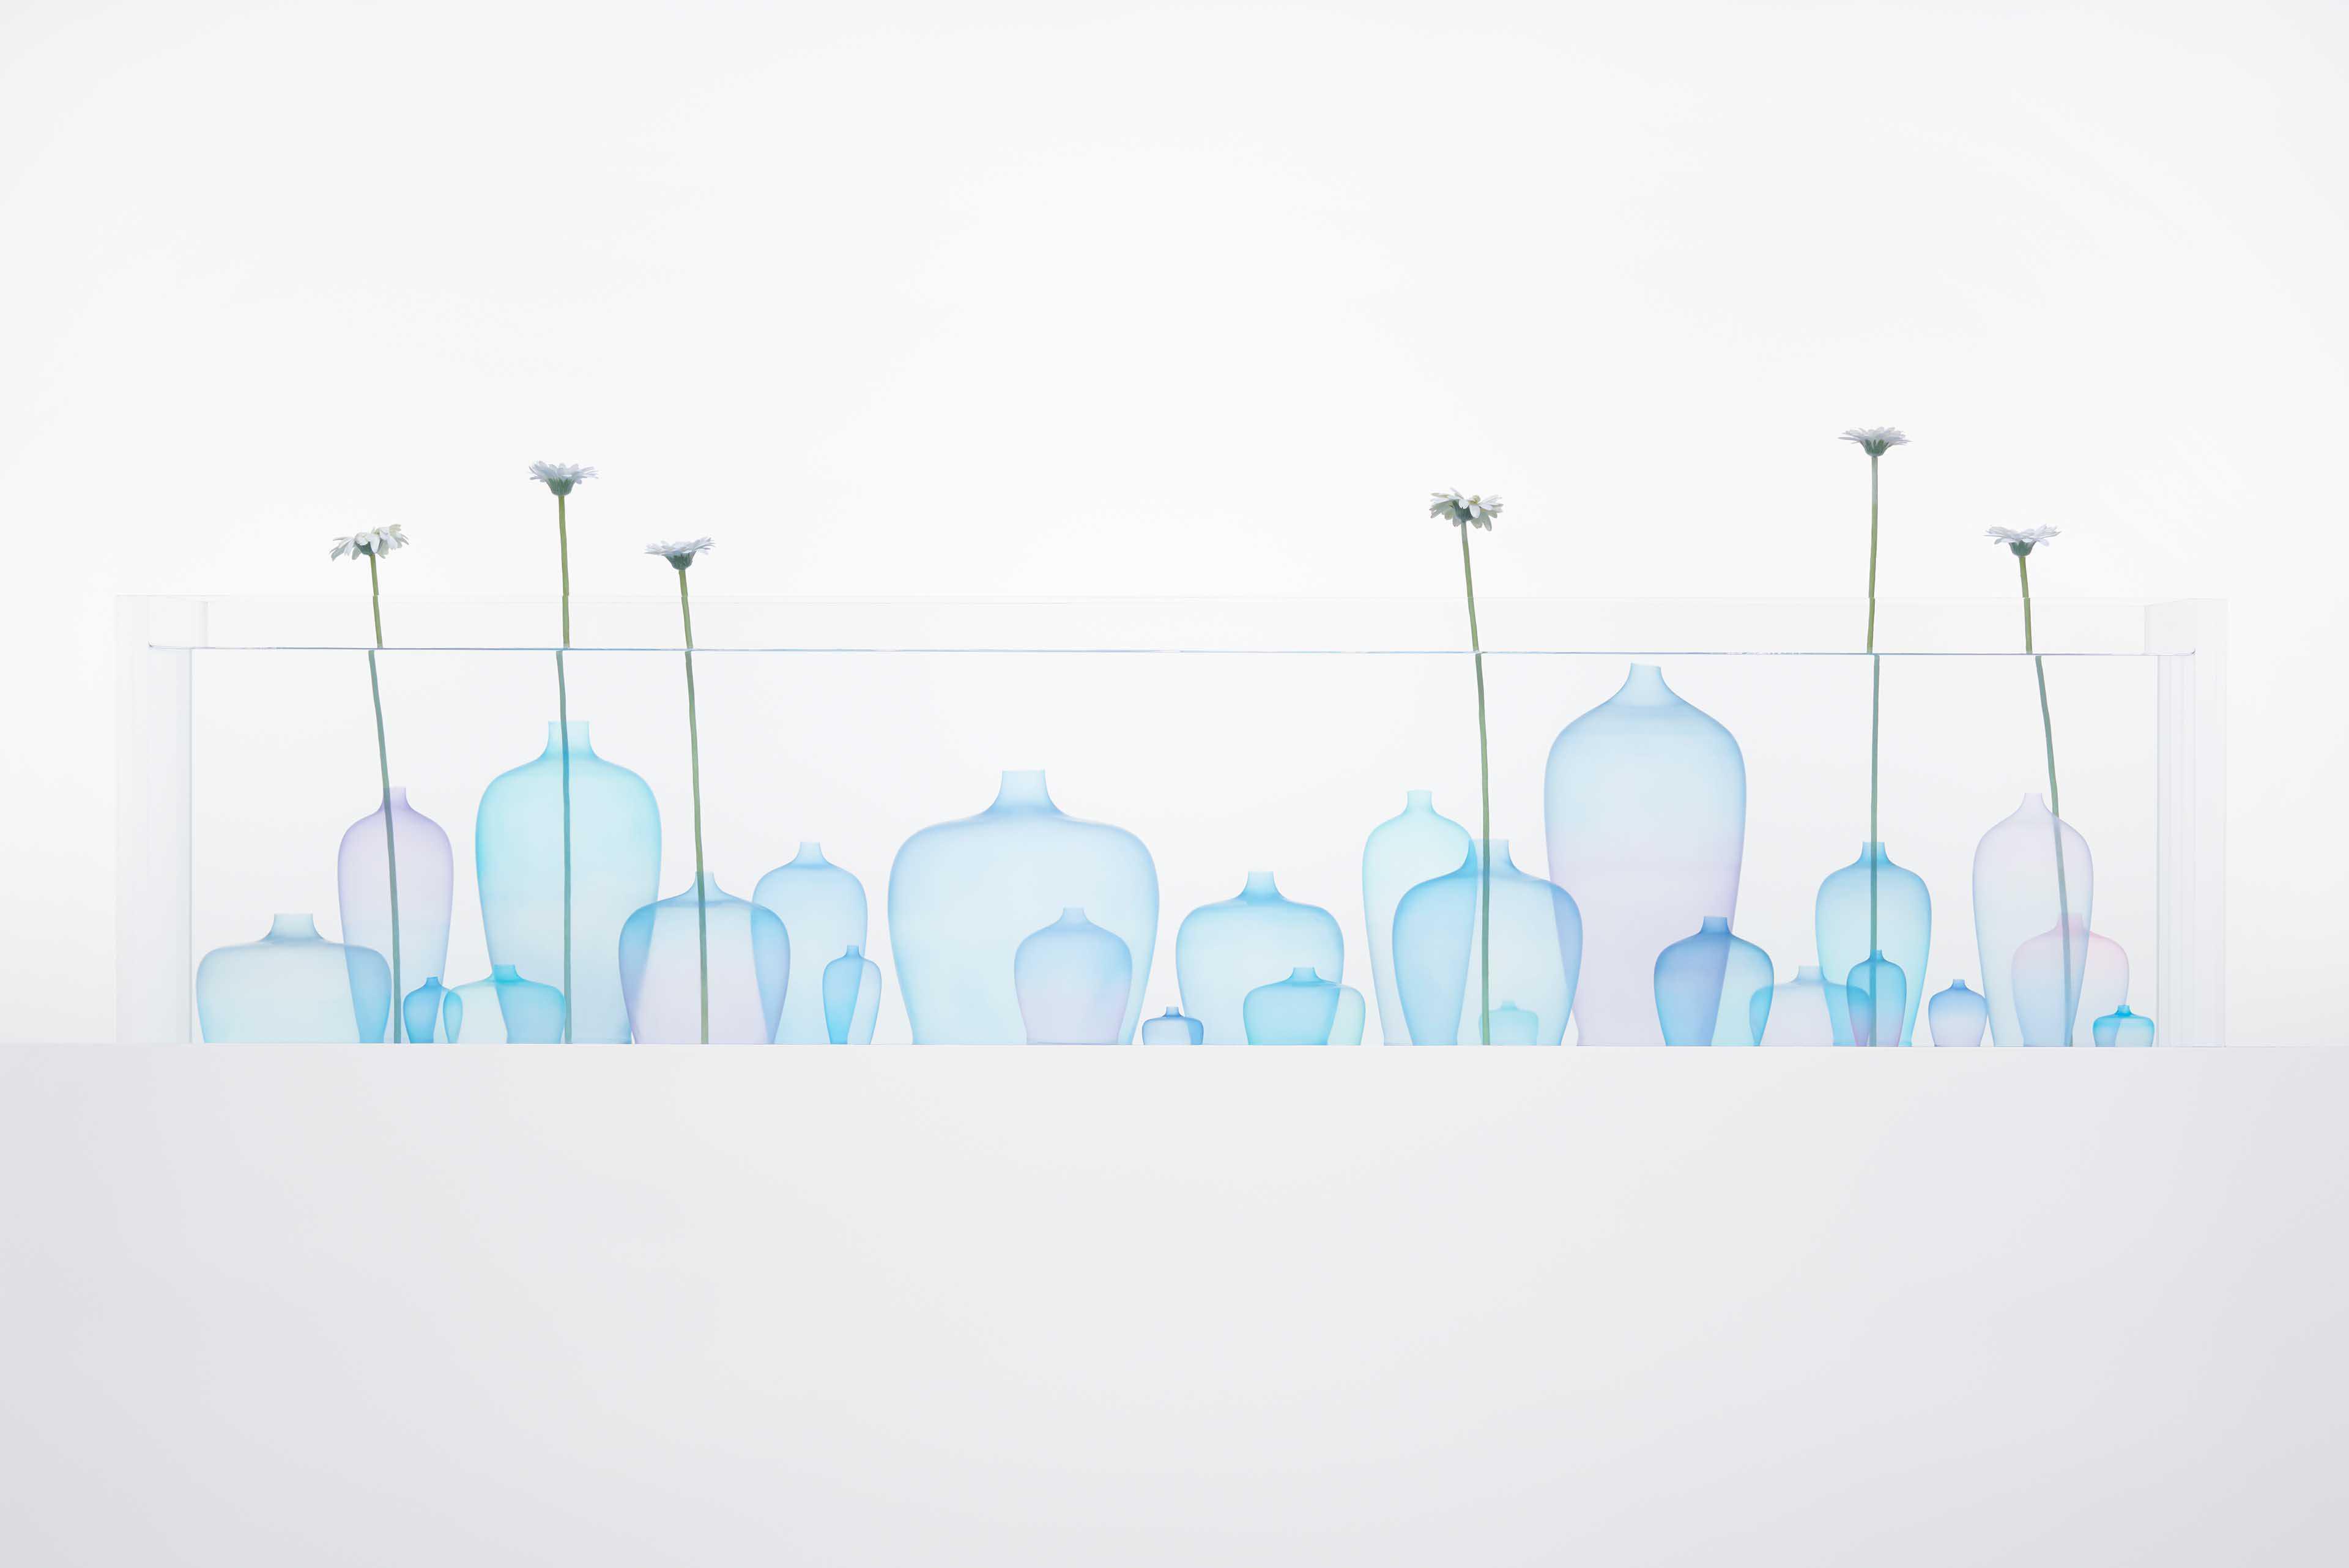 Nendo: Jellyfish Vase  - 1 jellyfish vase10 akihiro yoshida 38